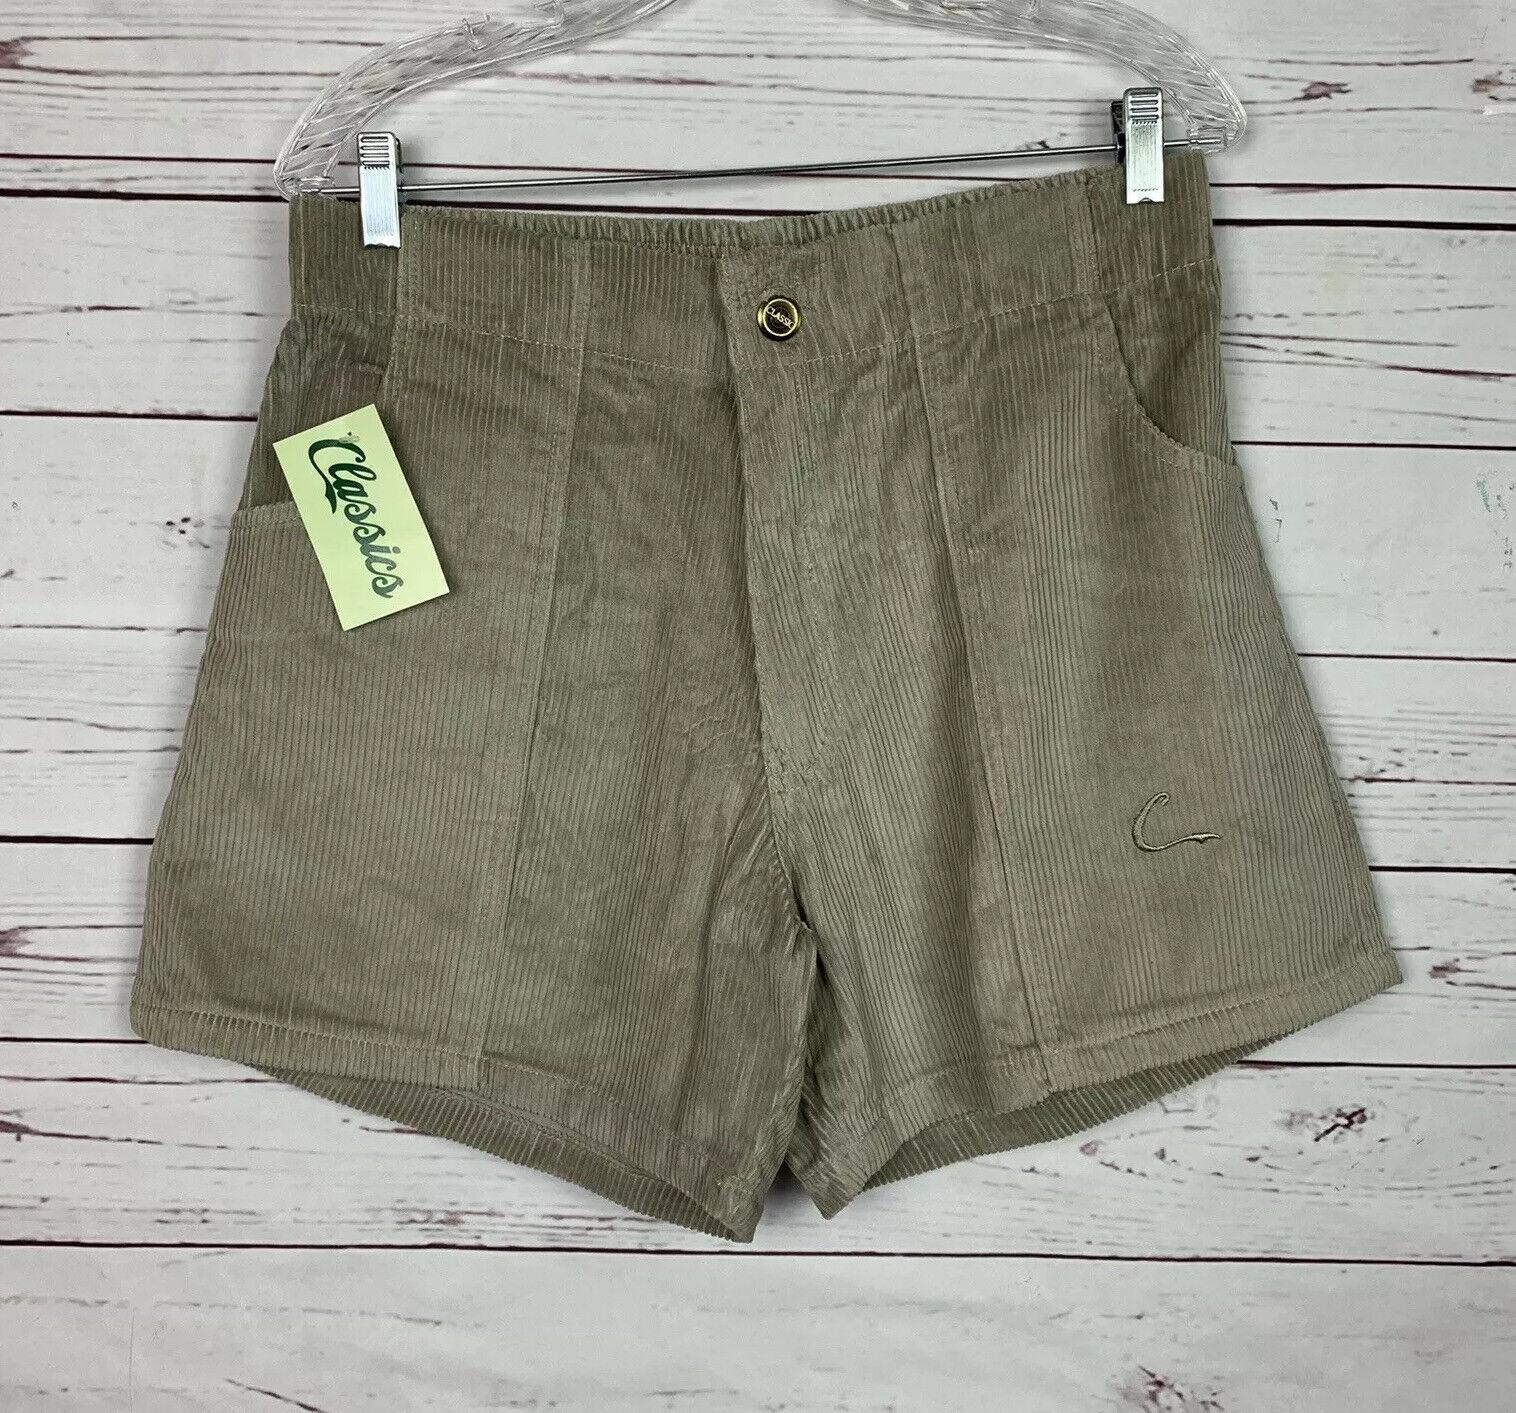 Vintage Tan Corduroy Classics OP Style shorts size 34-36